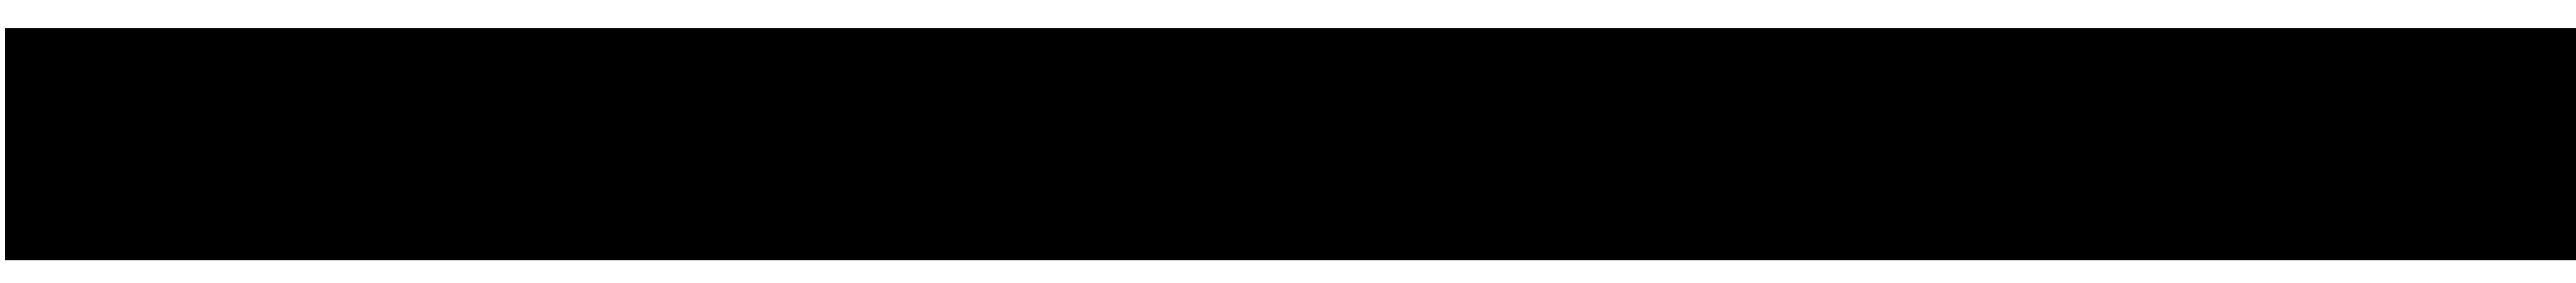 The_Irish_Times_logo_wordmark